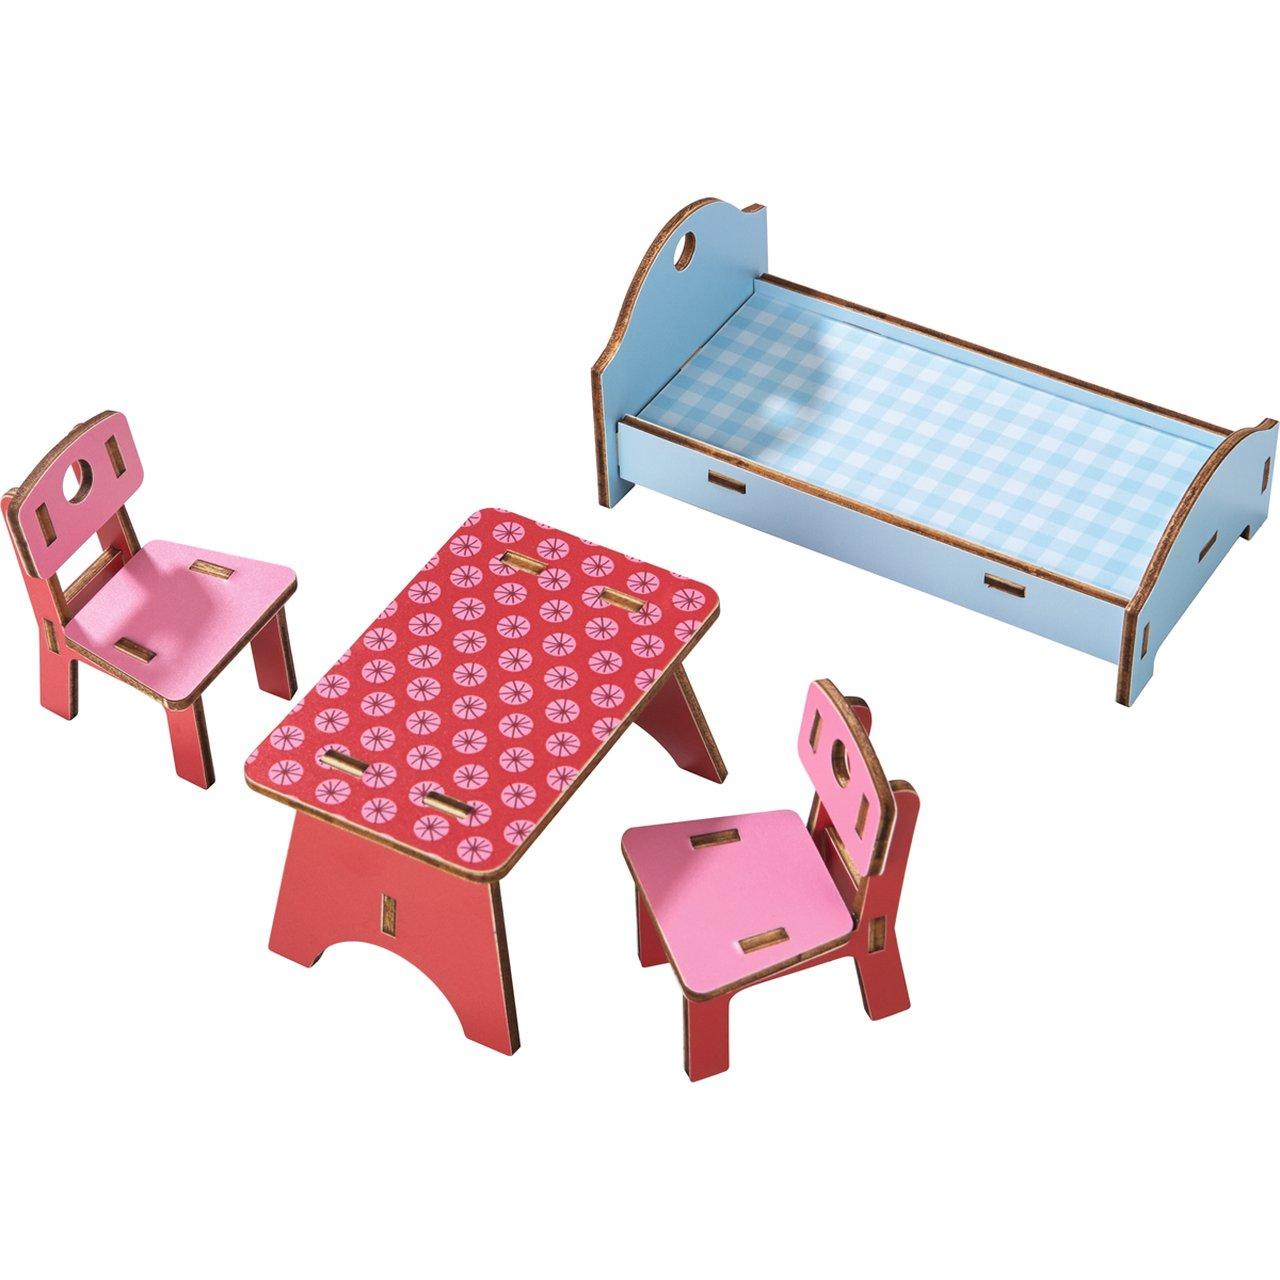 Little Friends Dollhouse Furniture Homestead